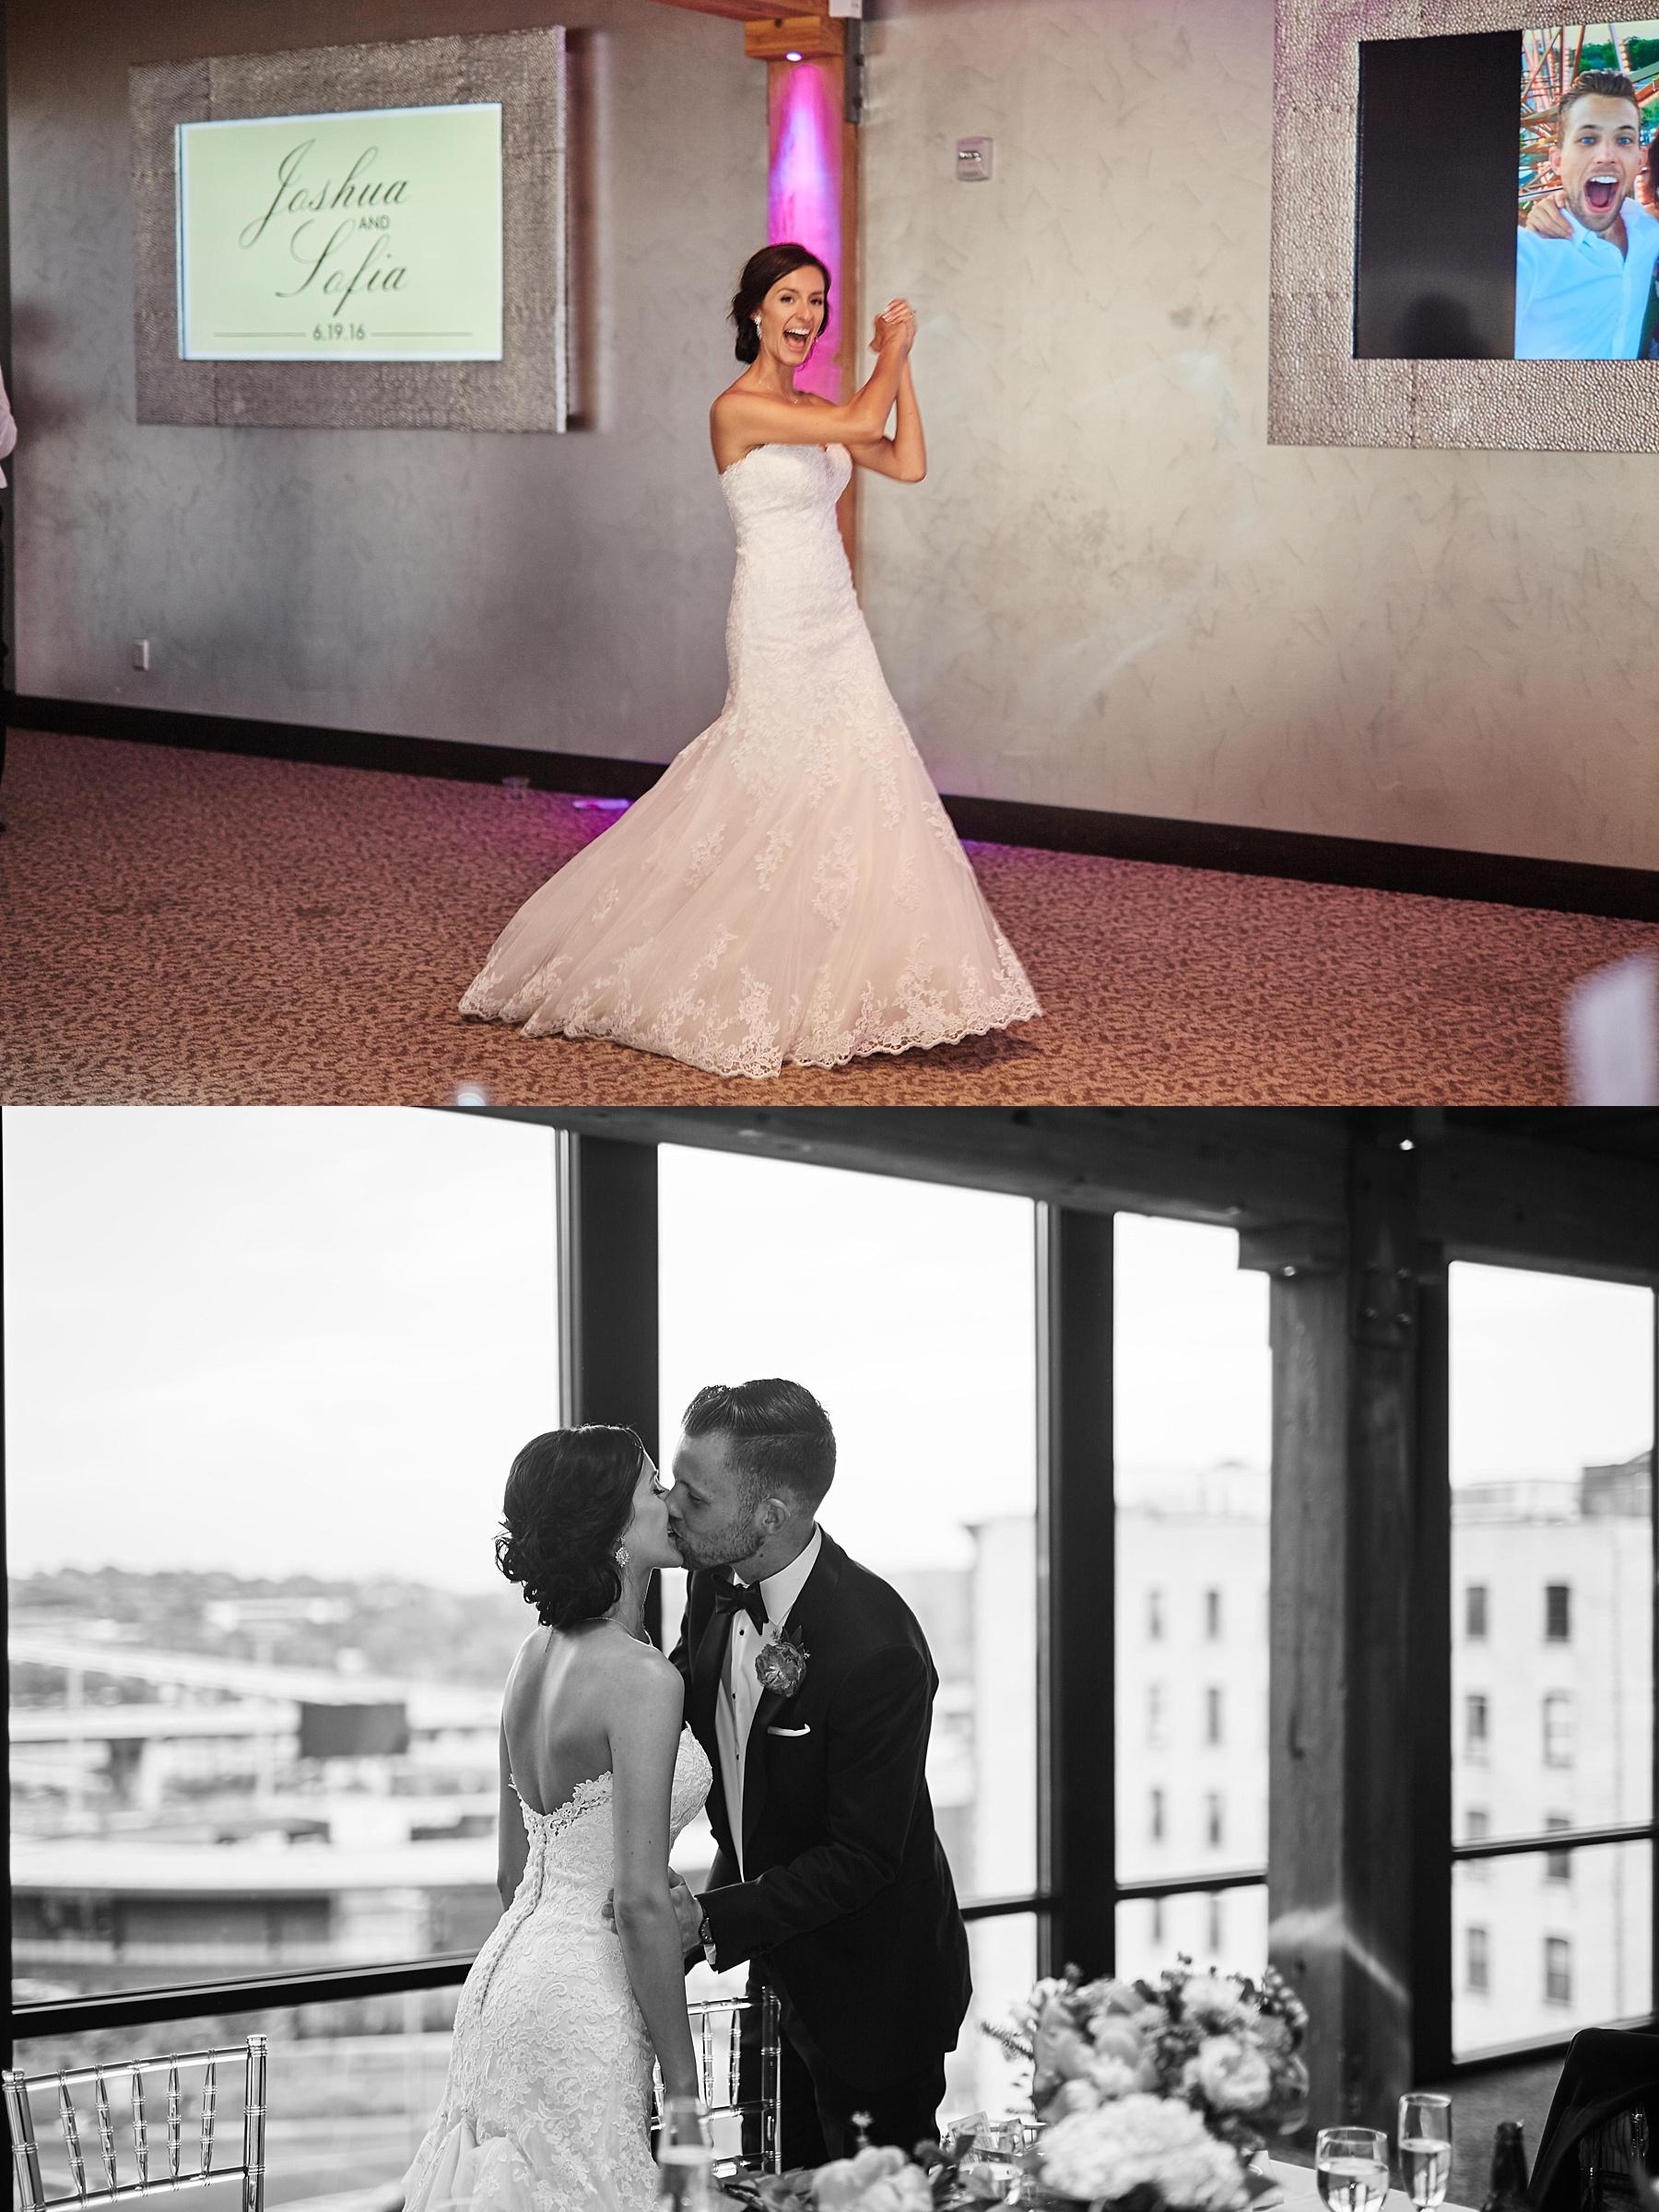 ABULAE-Wedding-Saint-paul-MN-Josh-Sofia-Wedding-Mears-Park_0816.jpg